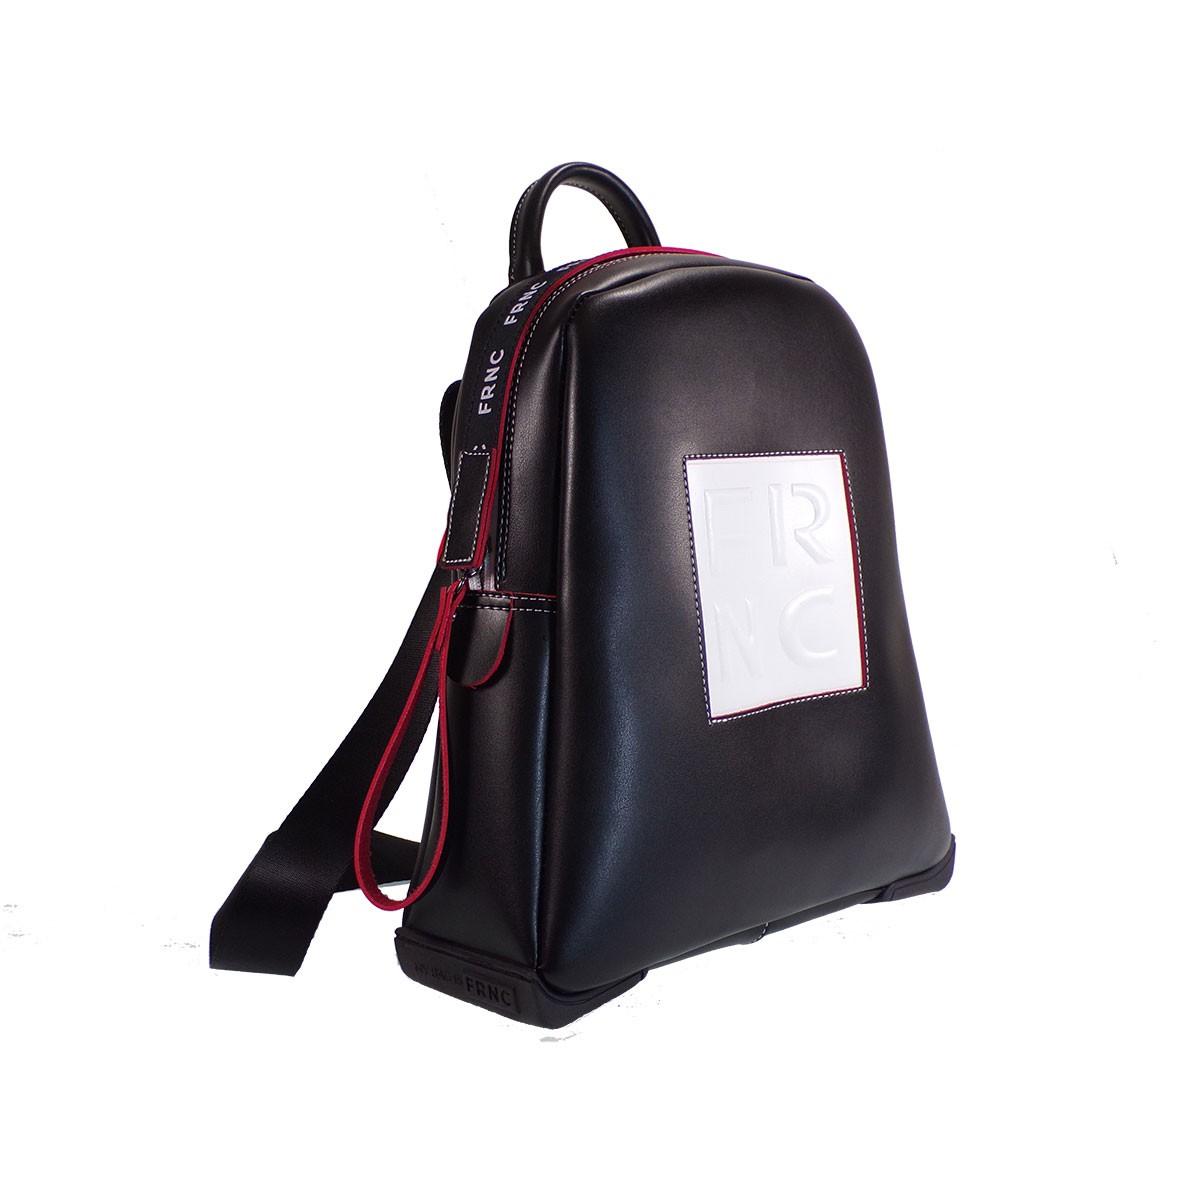 74d2638798 FRNC FRANCESCO Τσάντα Γυναικεία Πλάτης-Backpack 2023 Μαύρο Δέρμα ...